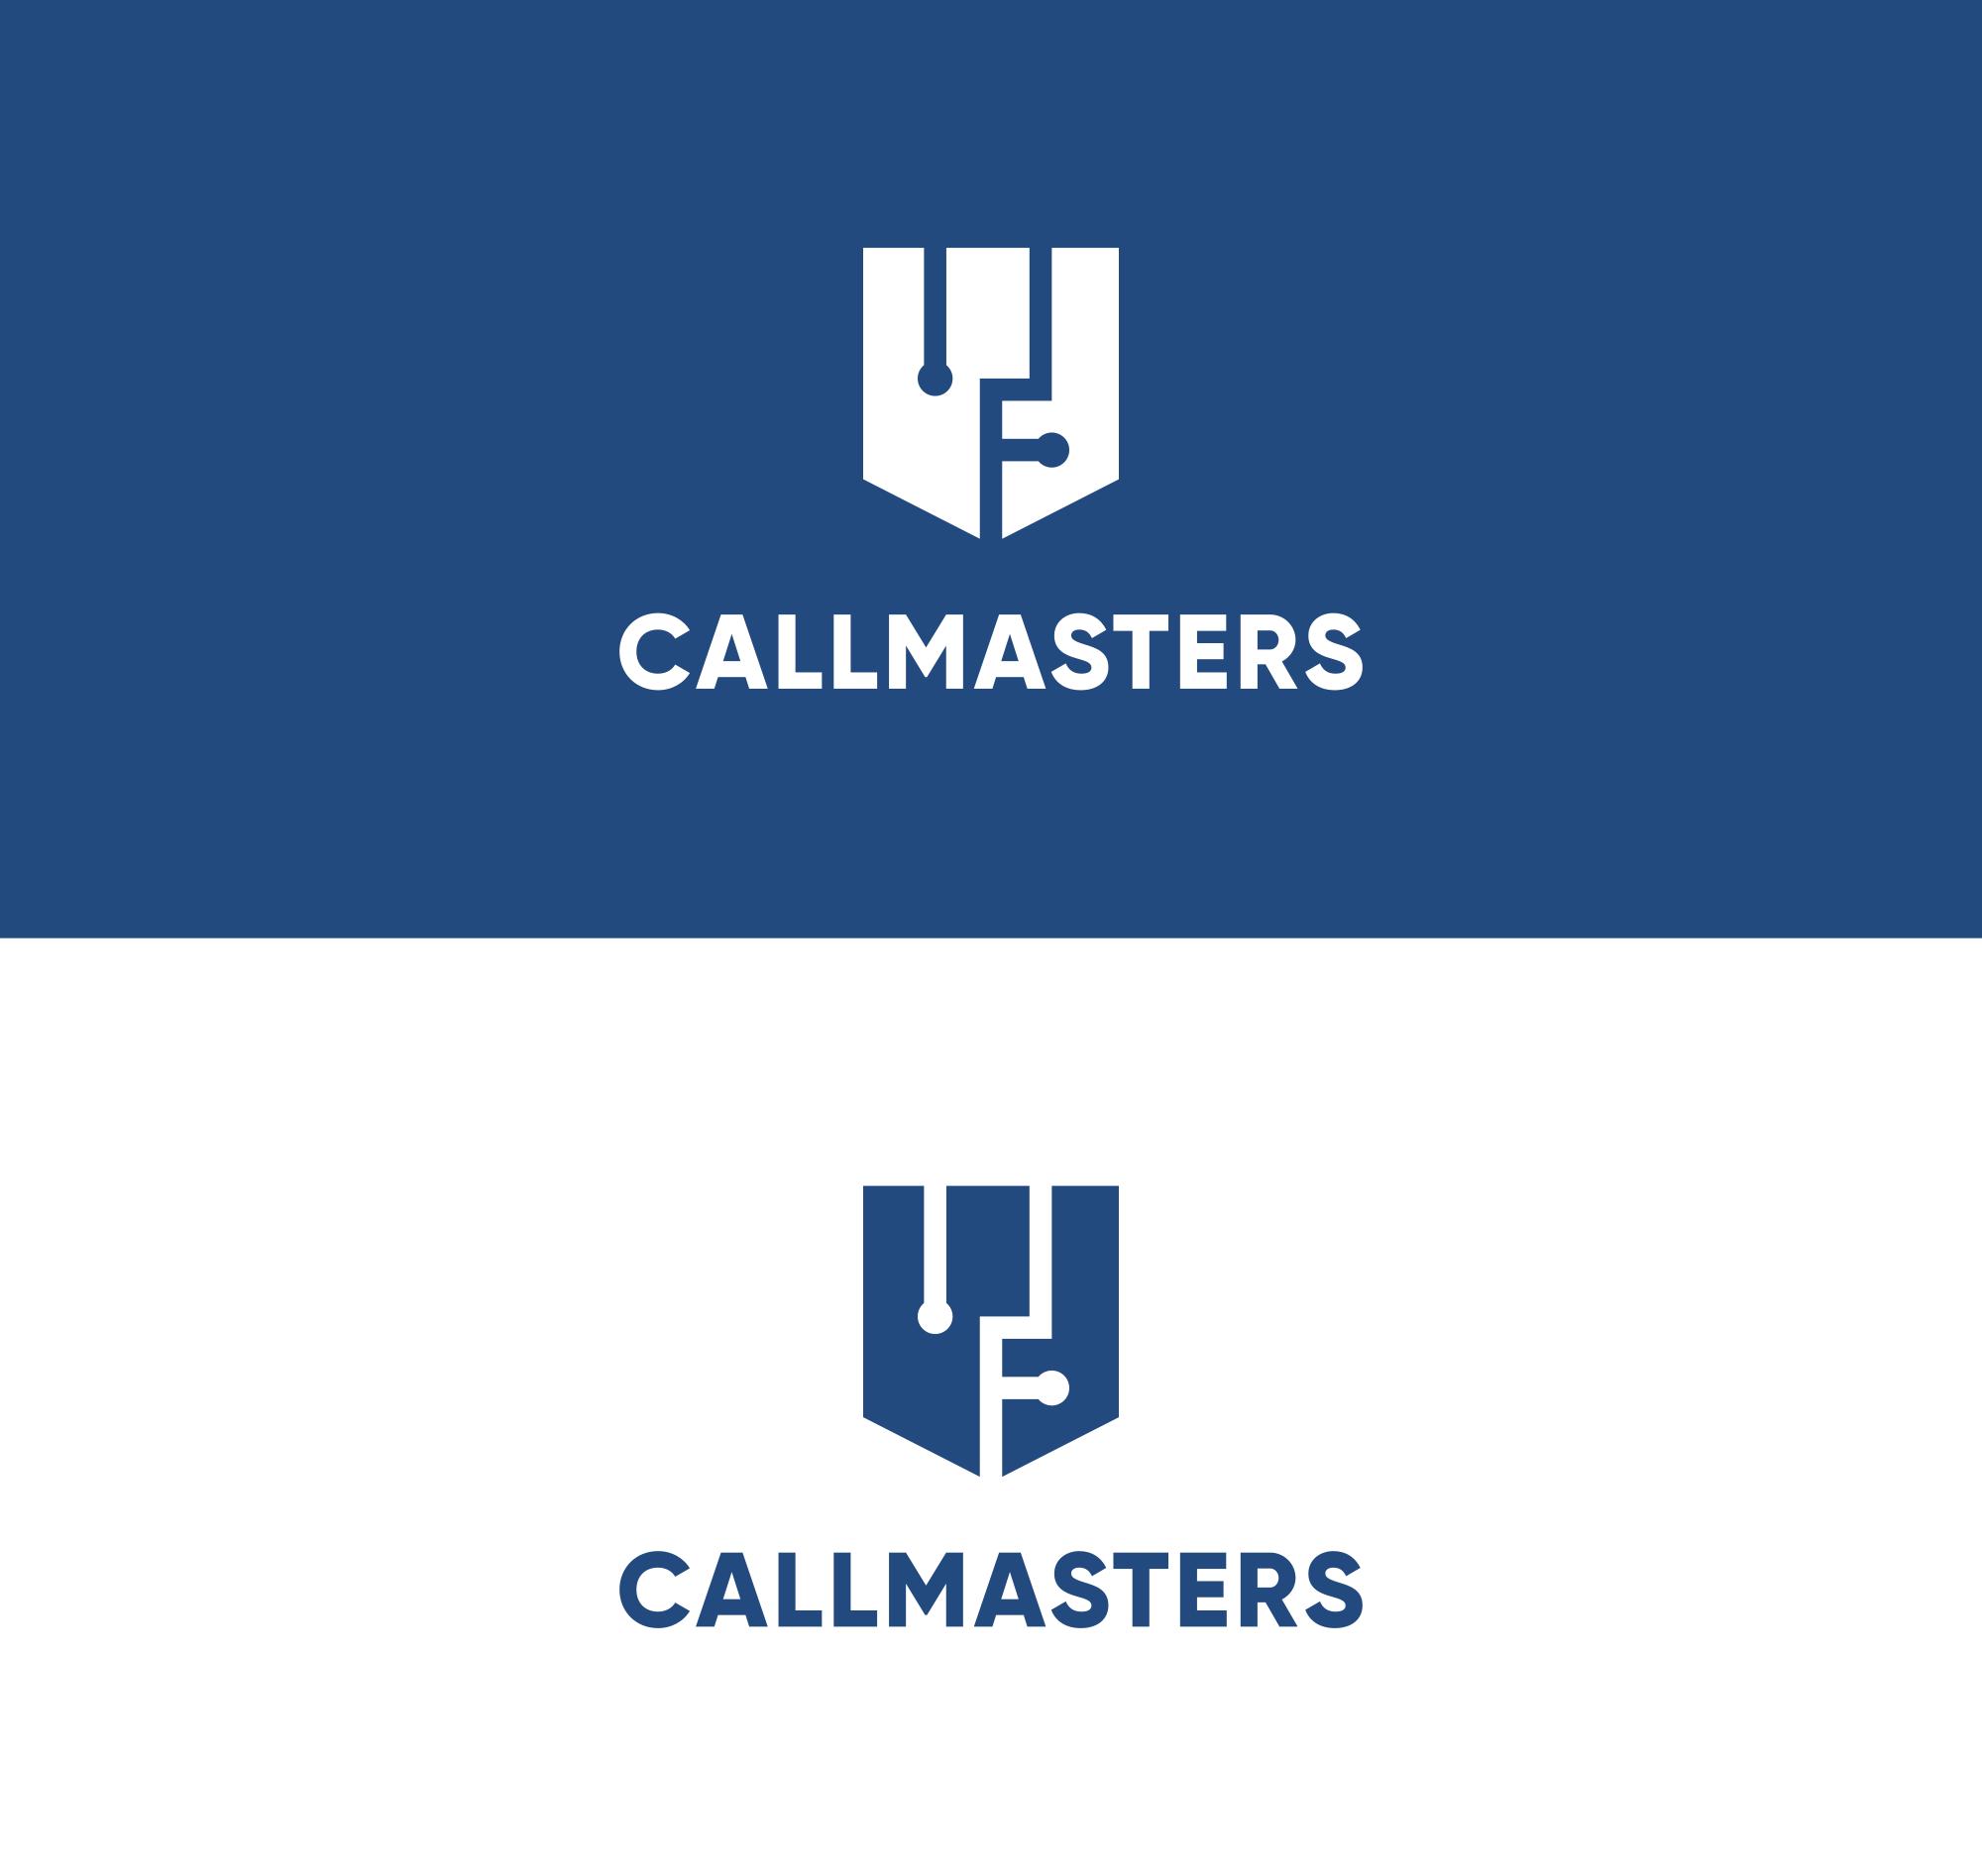 Логотип call-центра Callmasters  фото f_4205b73331033202.png